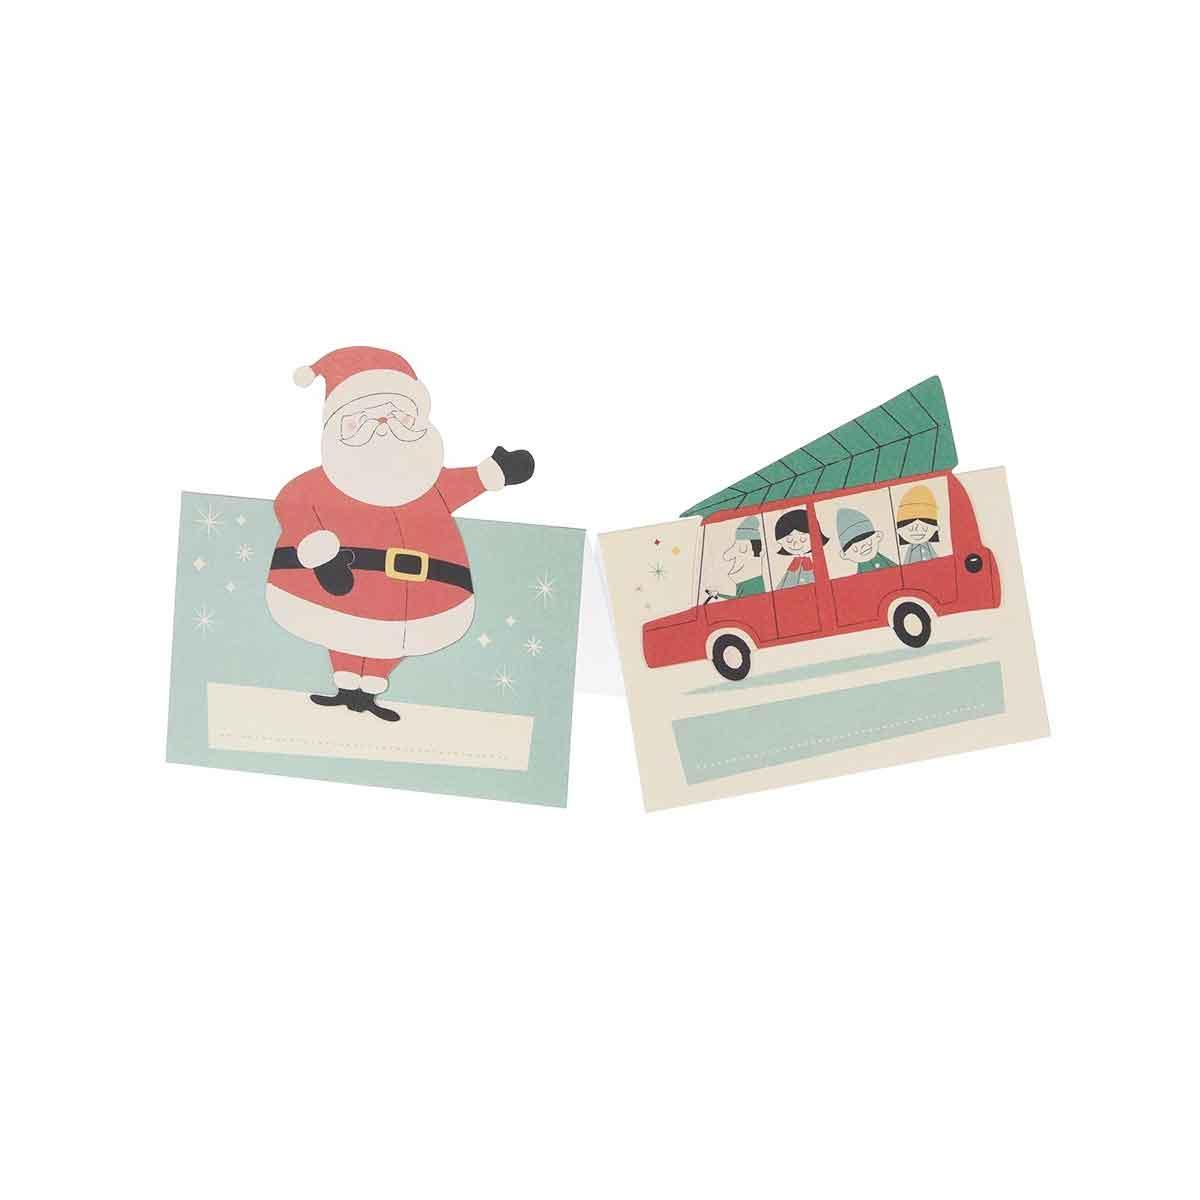 6 marques places de noël en carton avec motifs de Noël